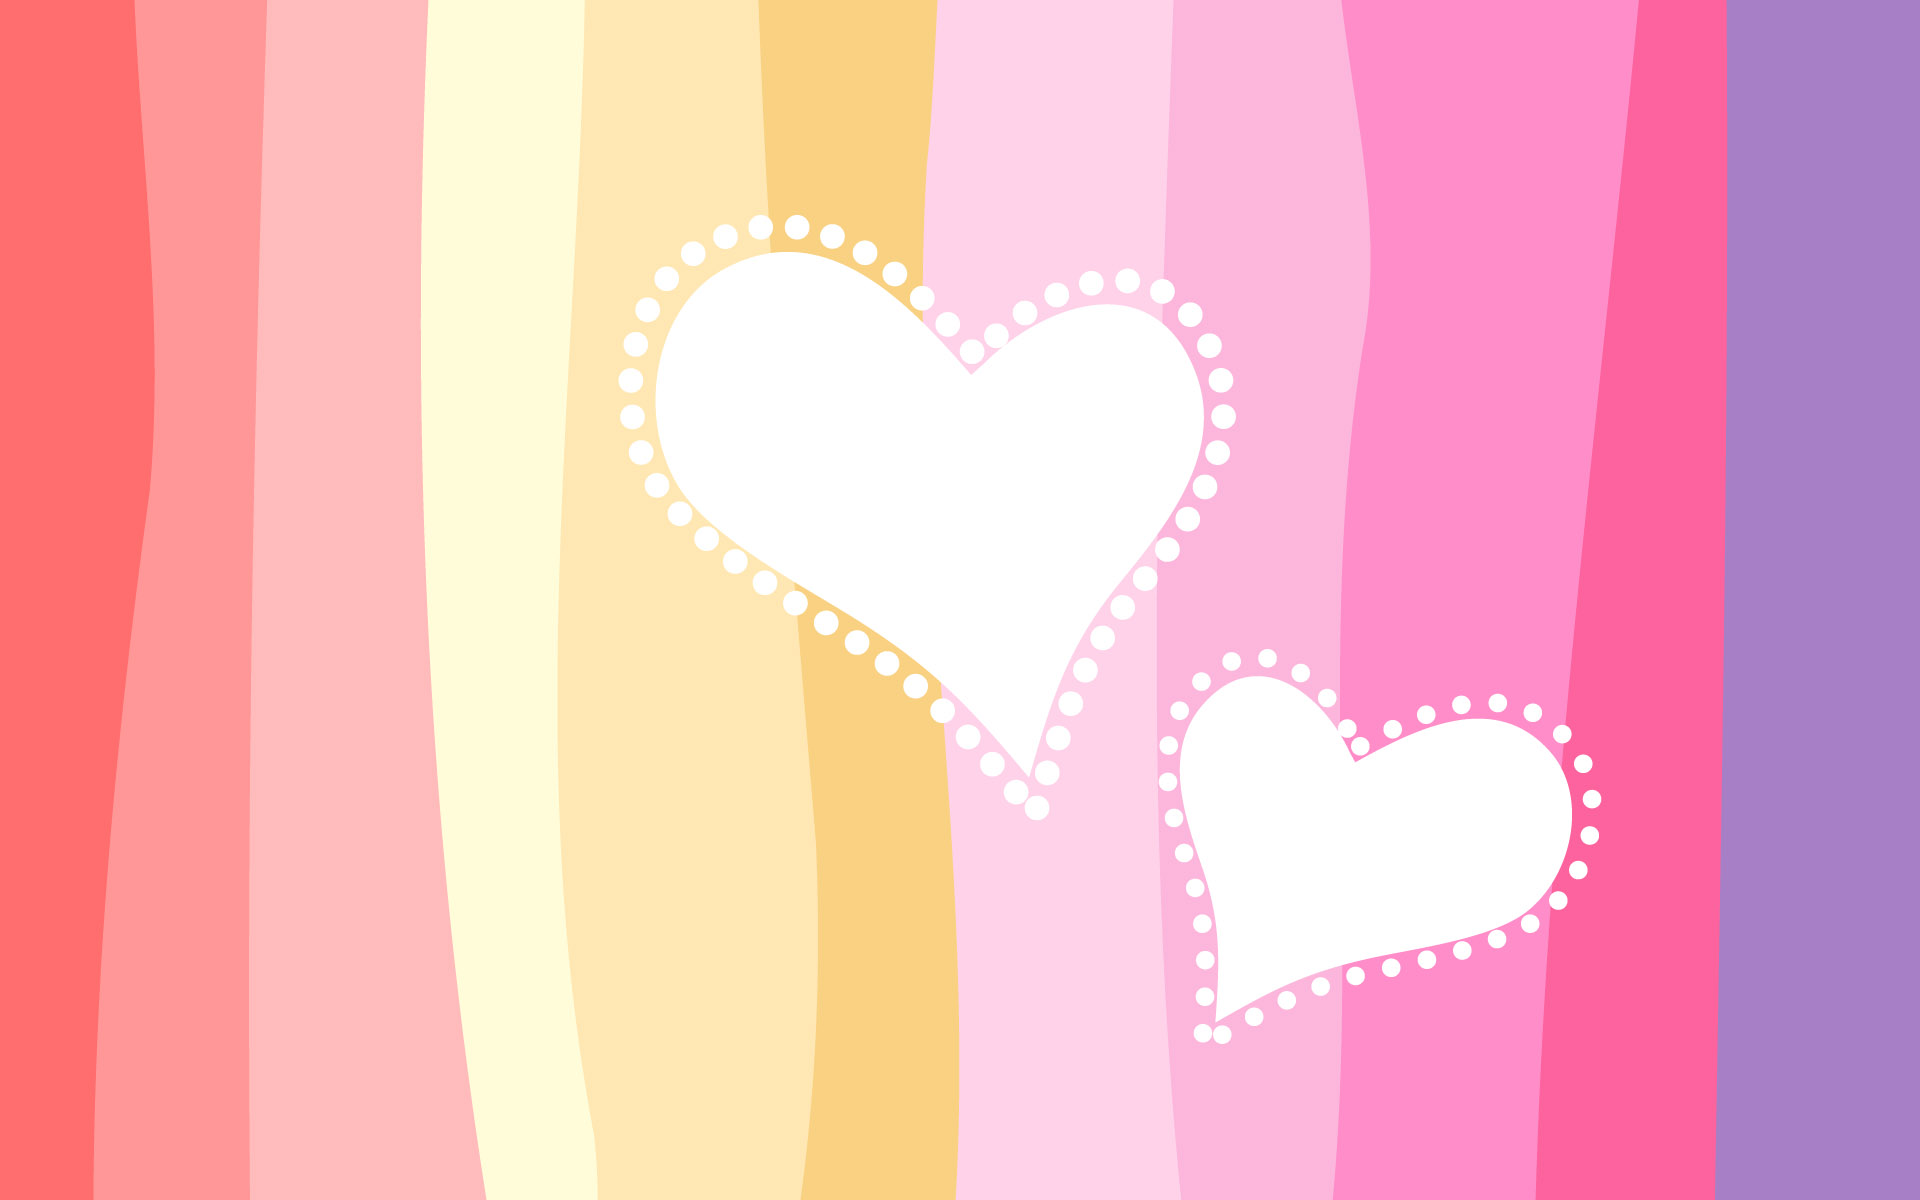 Valentine Colorful HD Wallpaper - Valentine Colorful HD Wallpaper